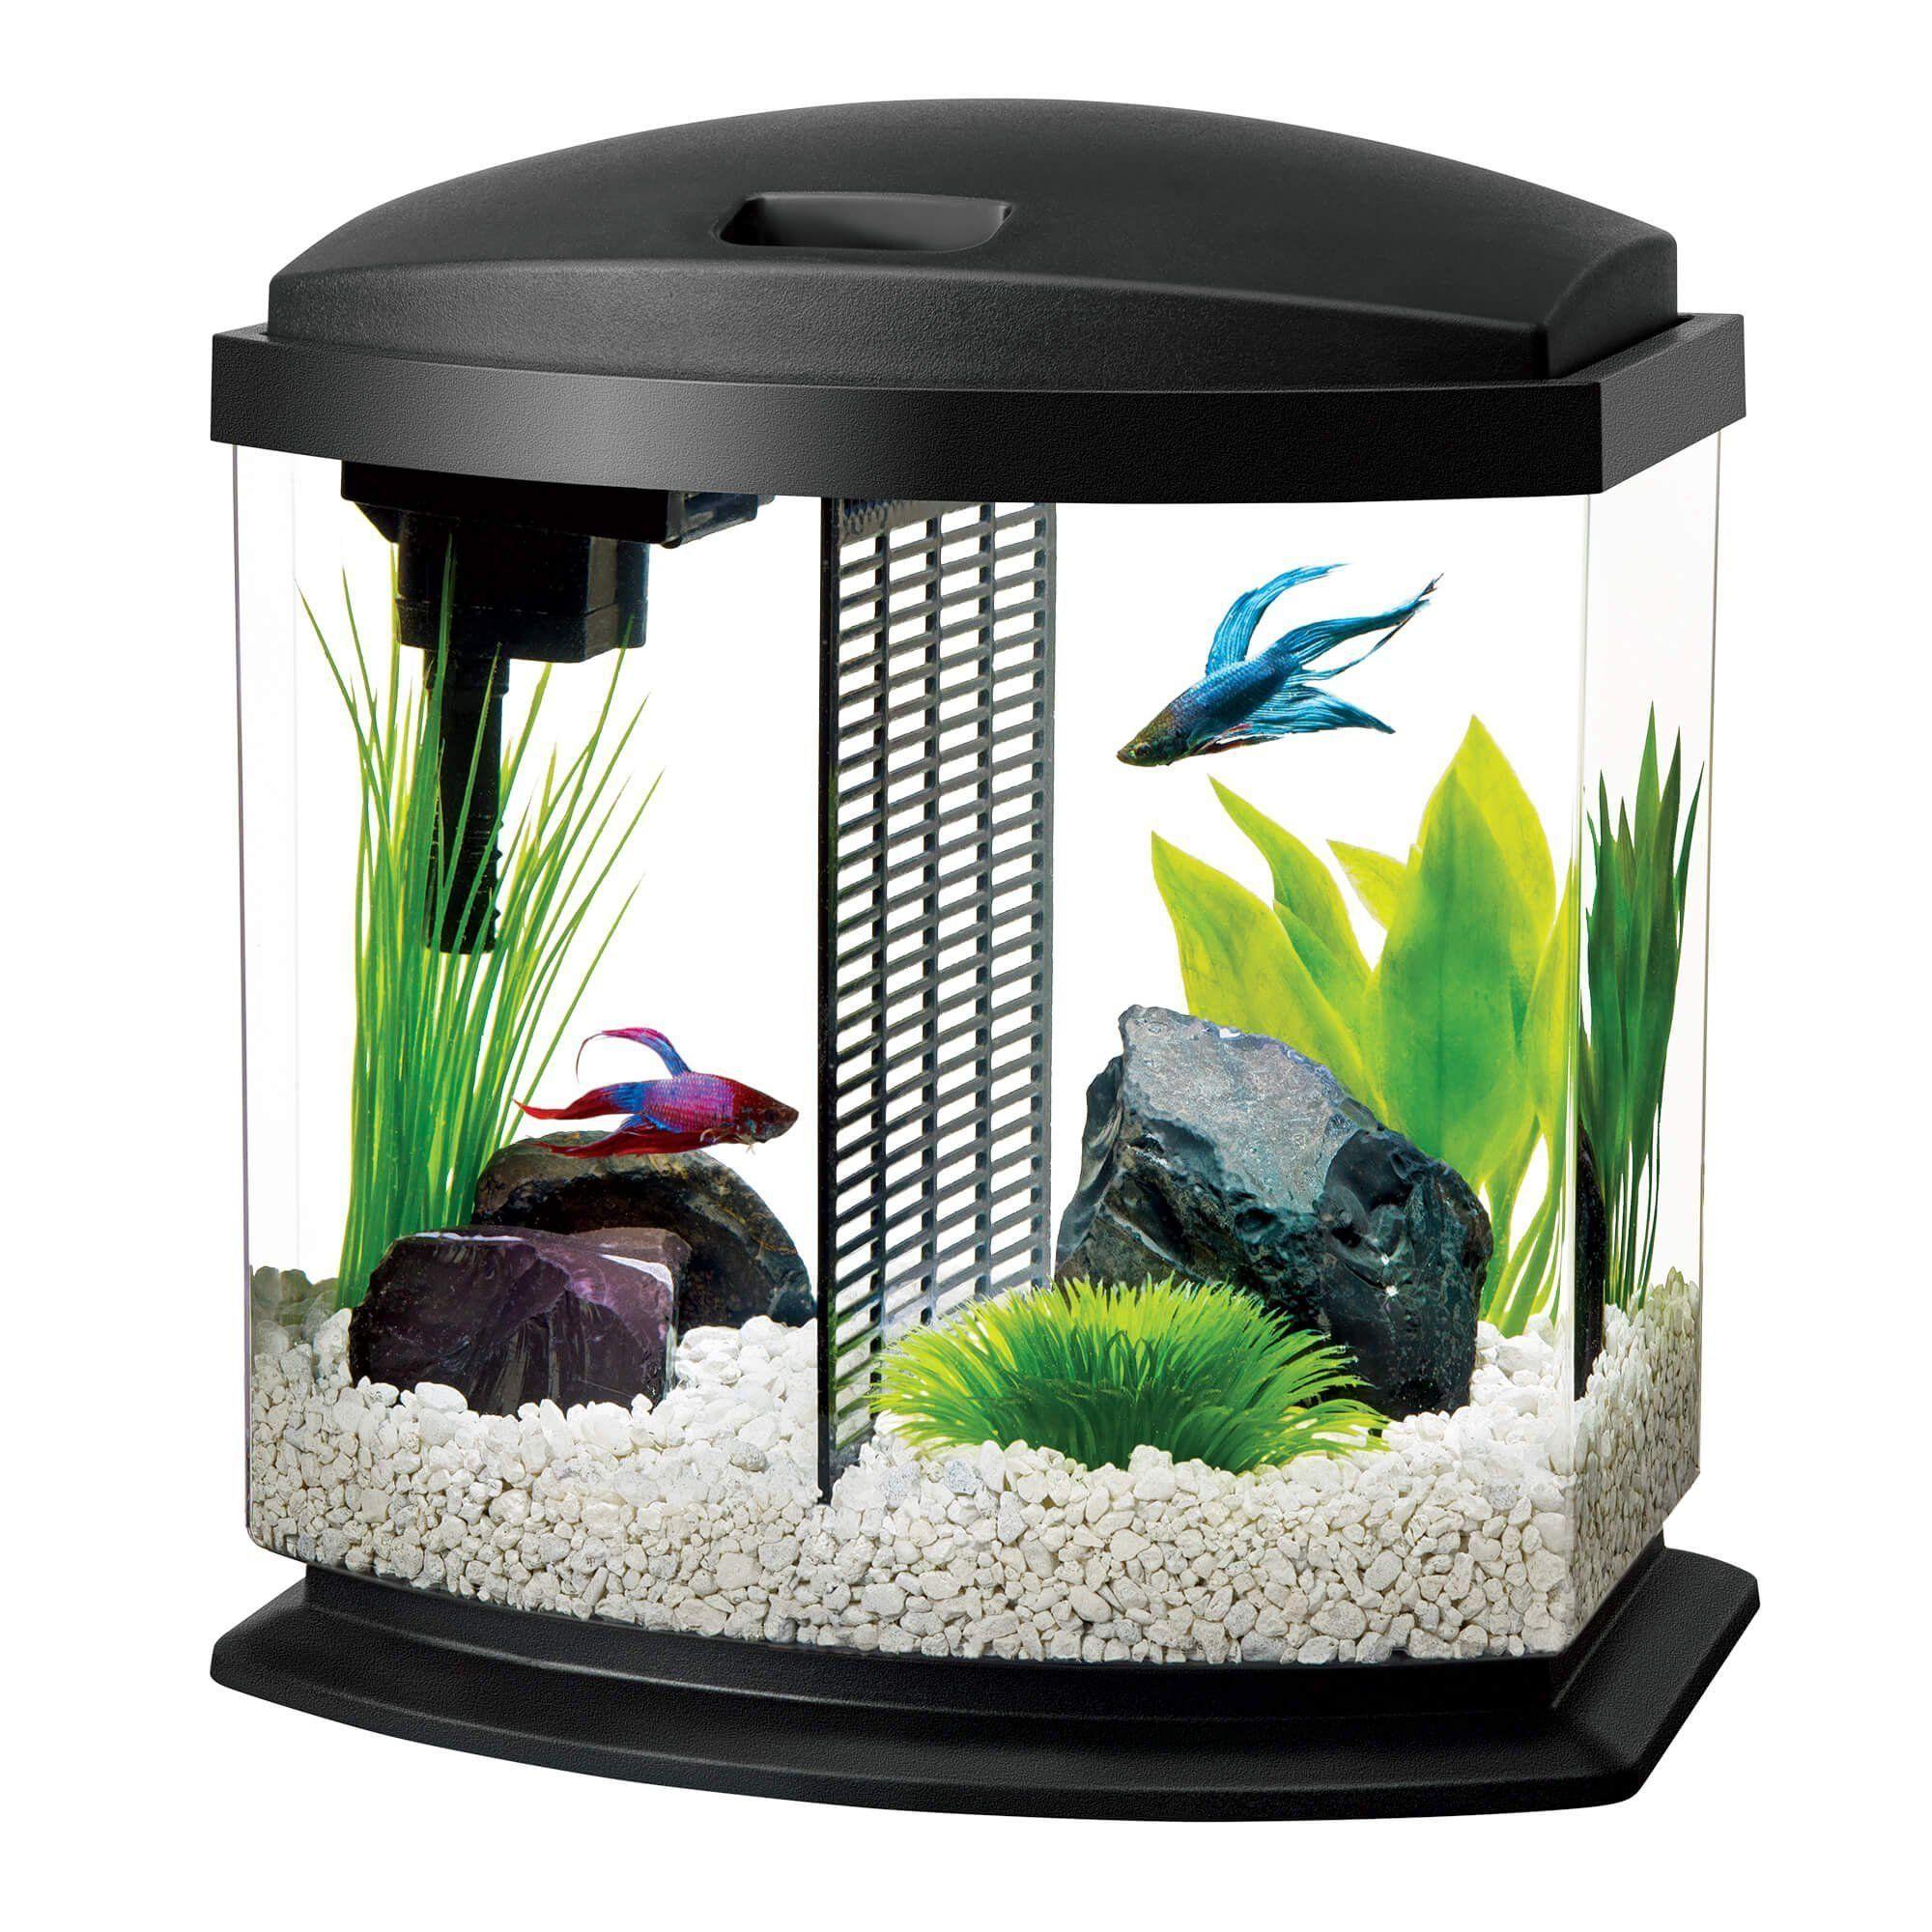 Aqueon 2 5 Gallon Bettabow Led Desktop Fish Aquarium Kit Black Petco Nano Tanks Aquarium Aqueon Bettabow Black Desktop Fish Ga Aquarium Fish Aquarium Kit Pet Fish